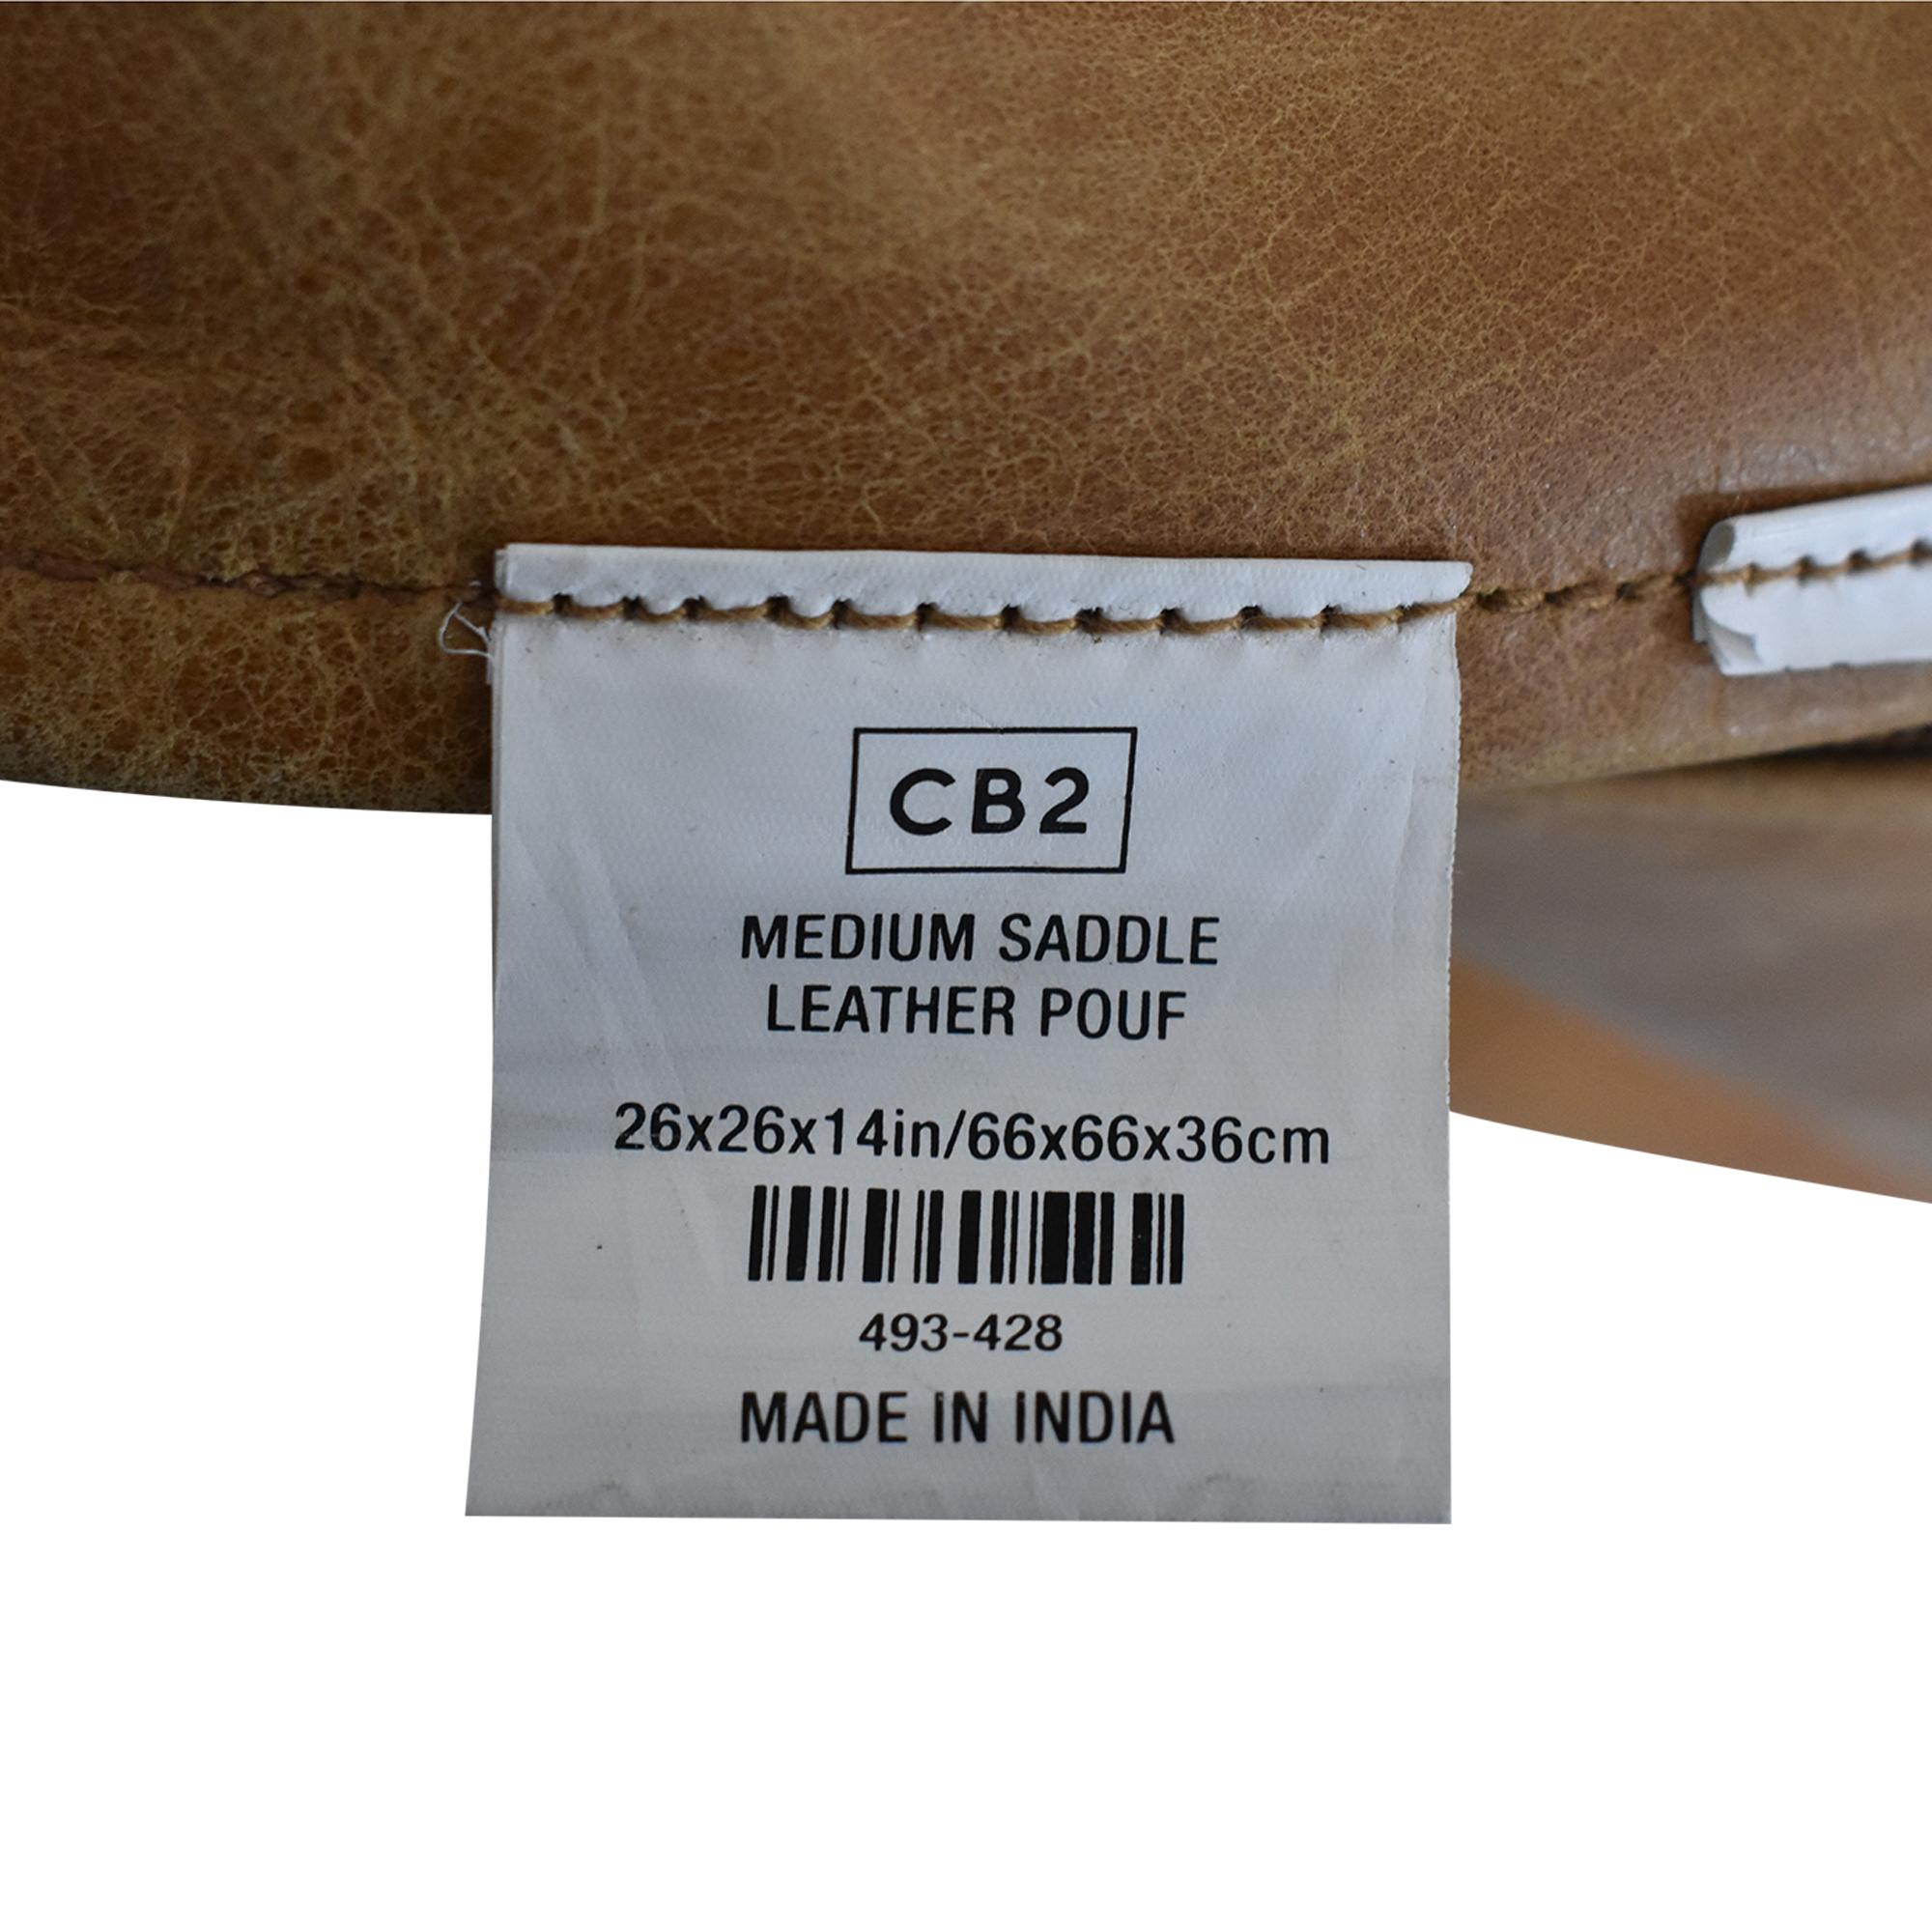 CB2 Medium Square Leather Ottoman Pouf sale